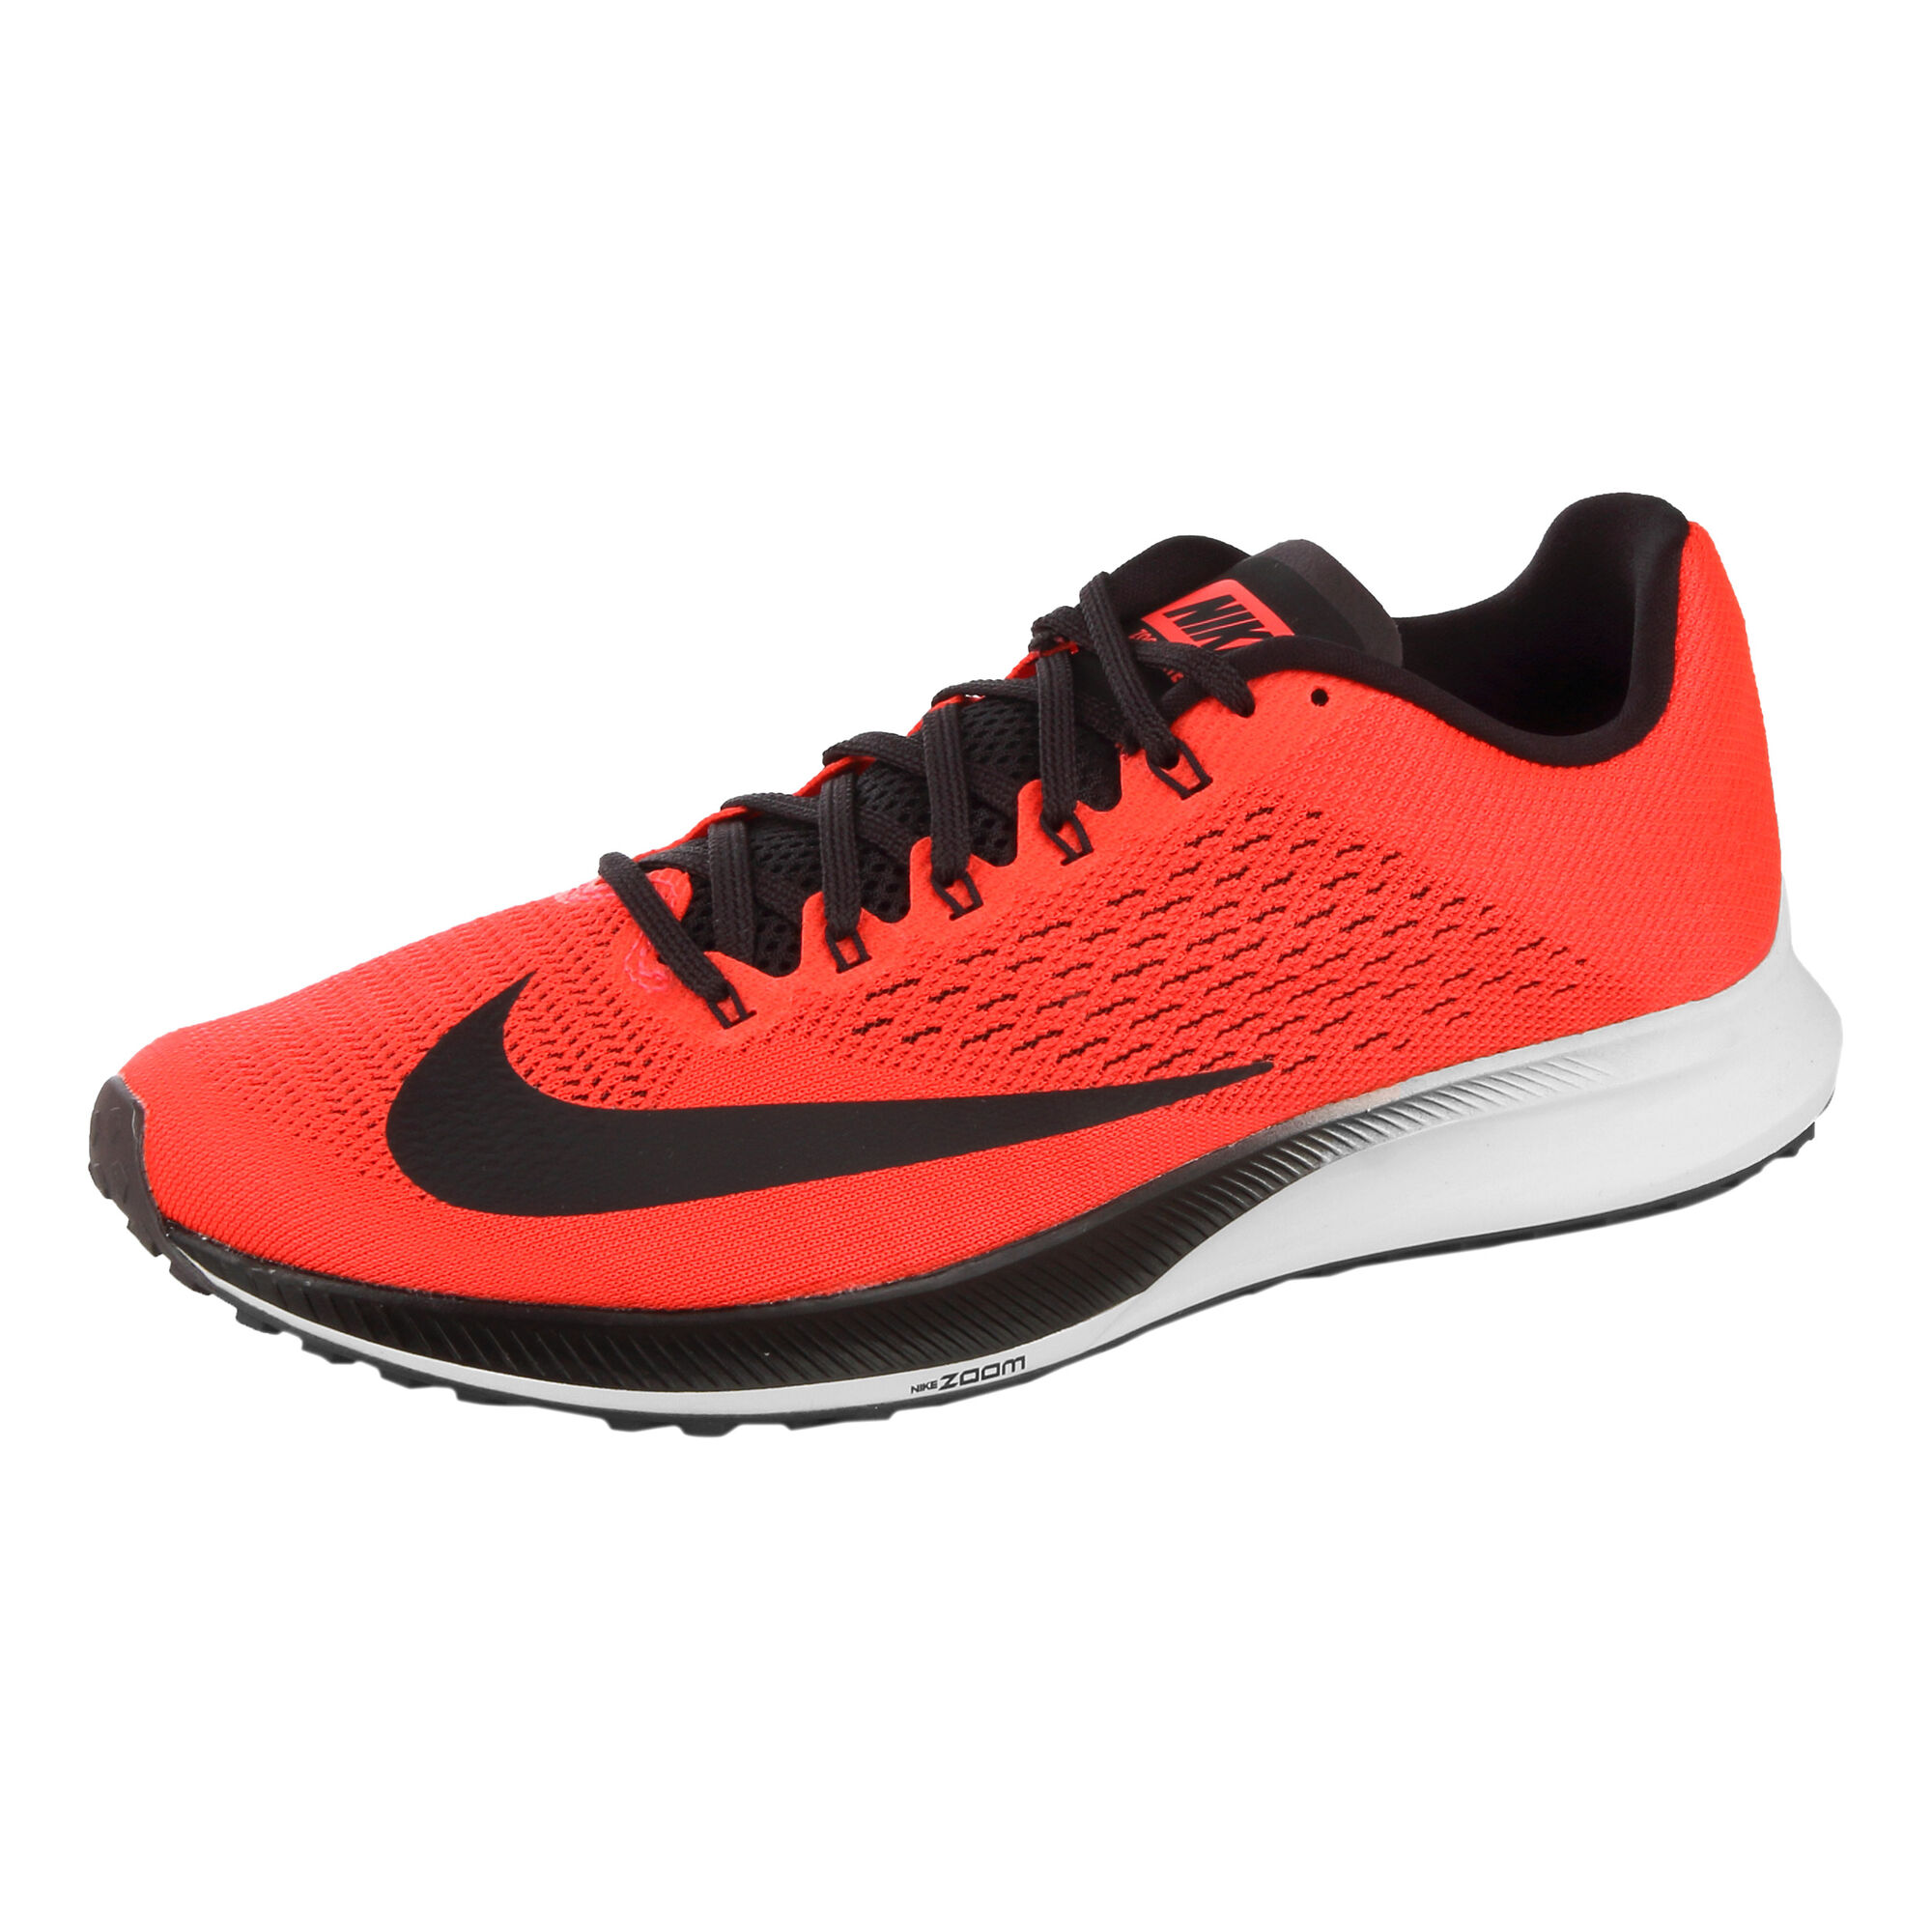 pedir en progreso cada vez  buy Nike Air Zoom Elite 10 Neutral Running Shoe Men - Red, Black online |  Jogging-Point